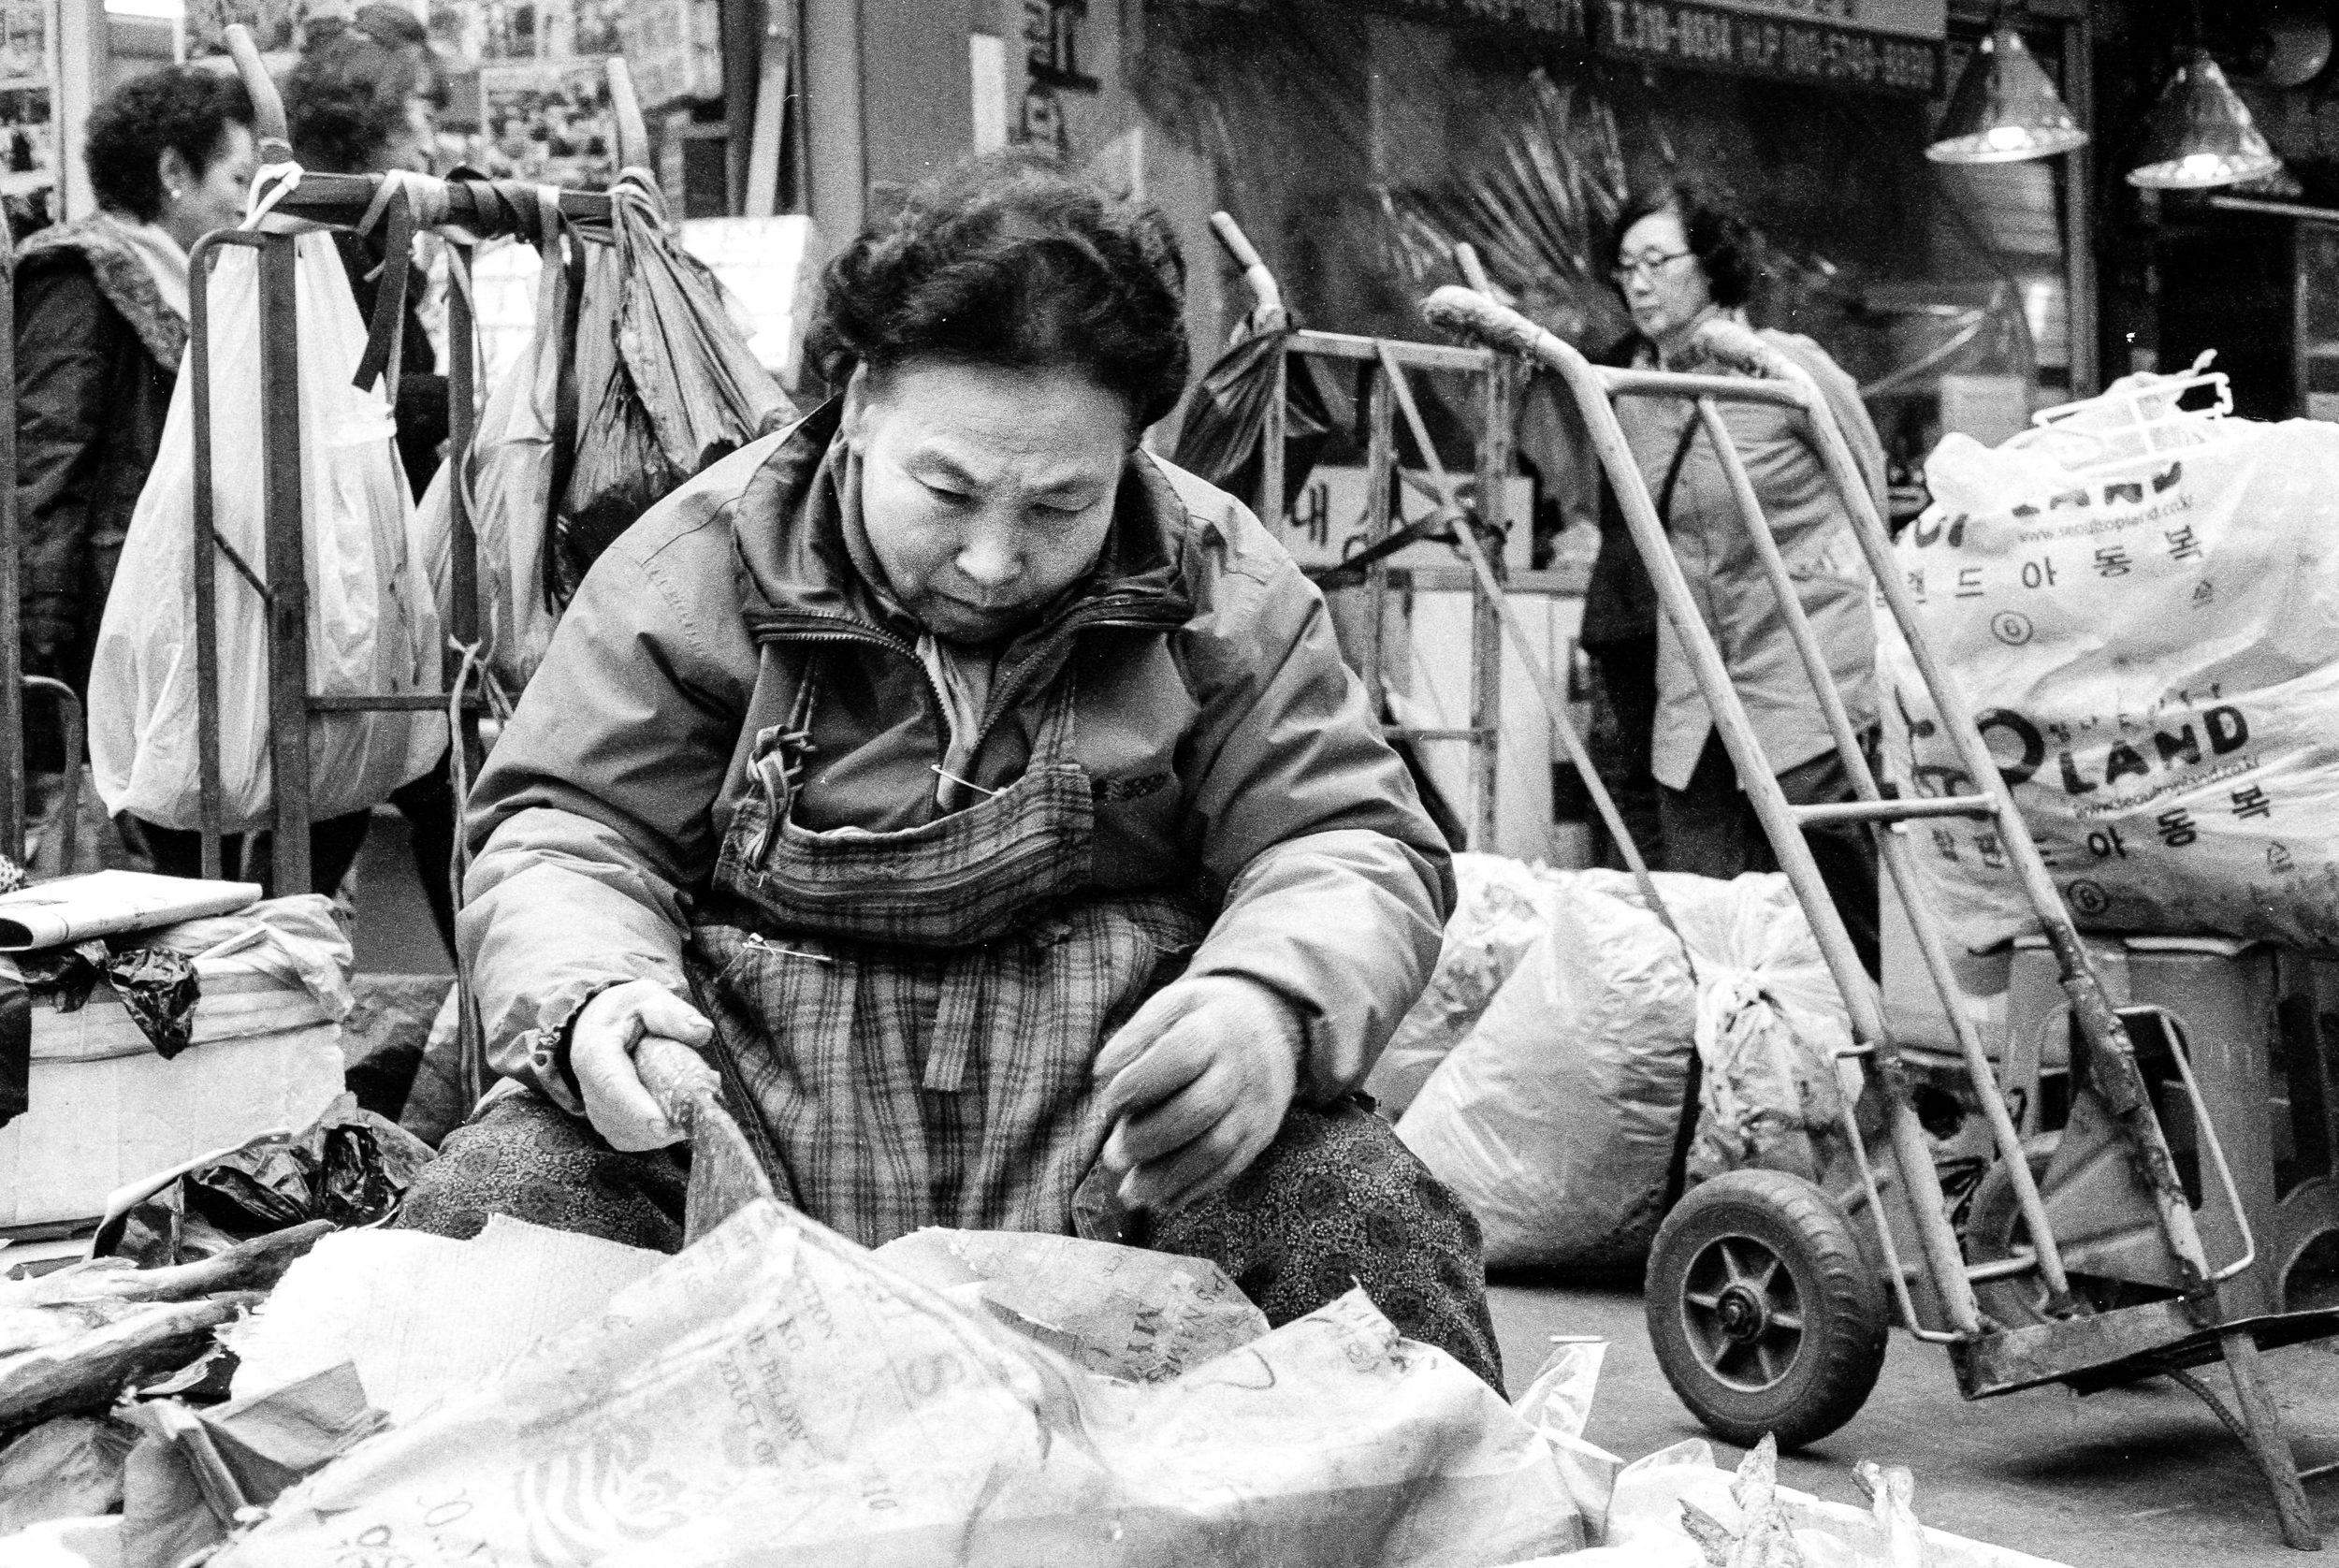 02-streetasiafilm-002.jpg